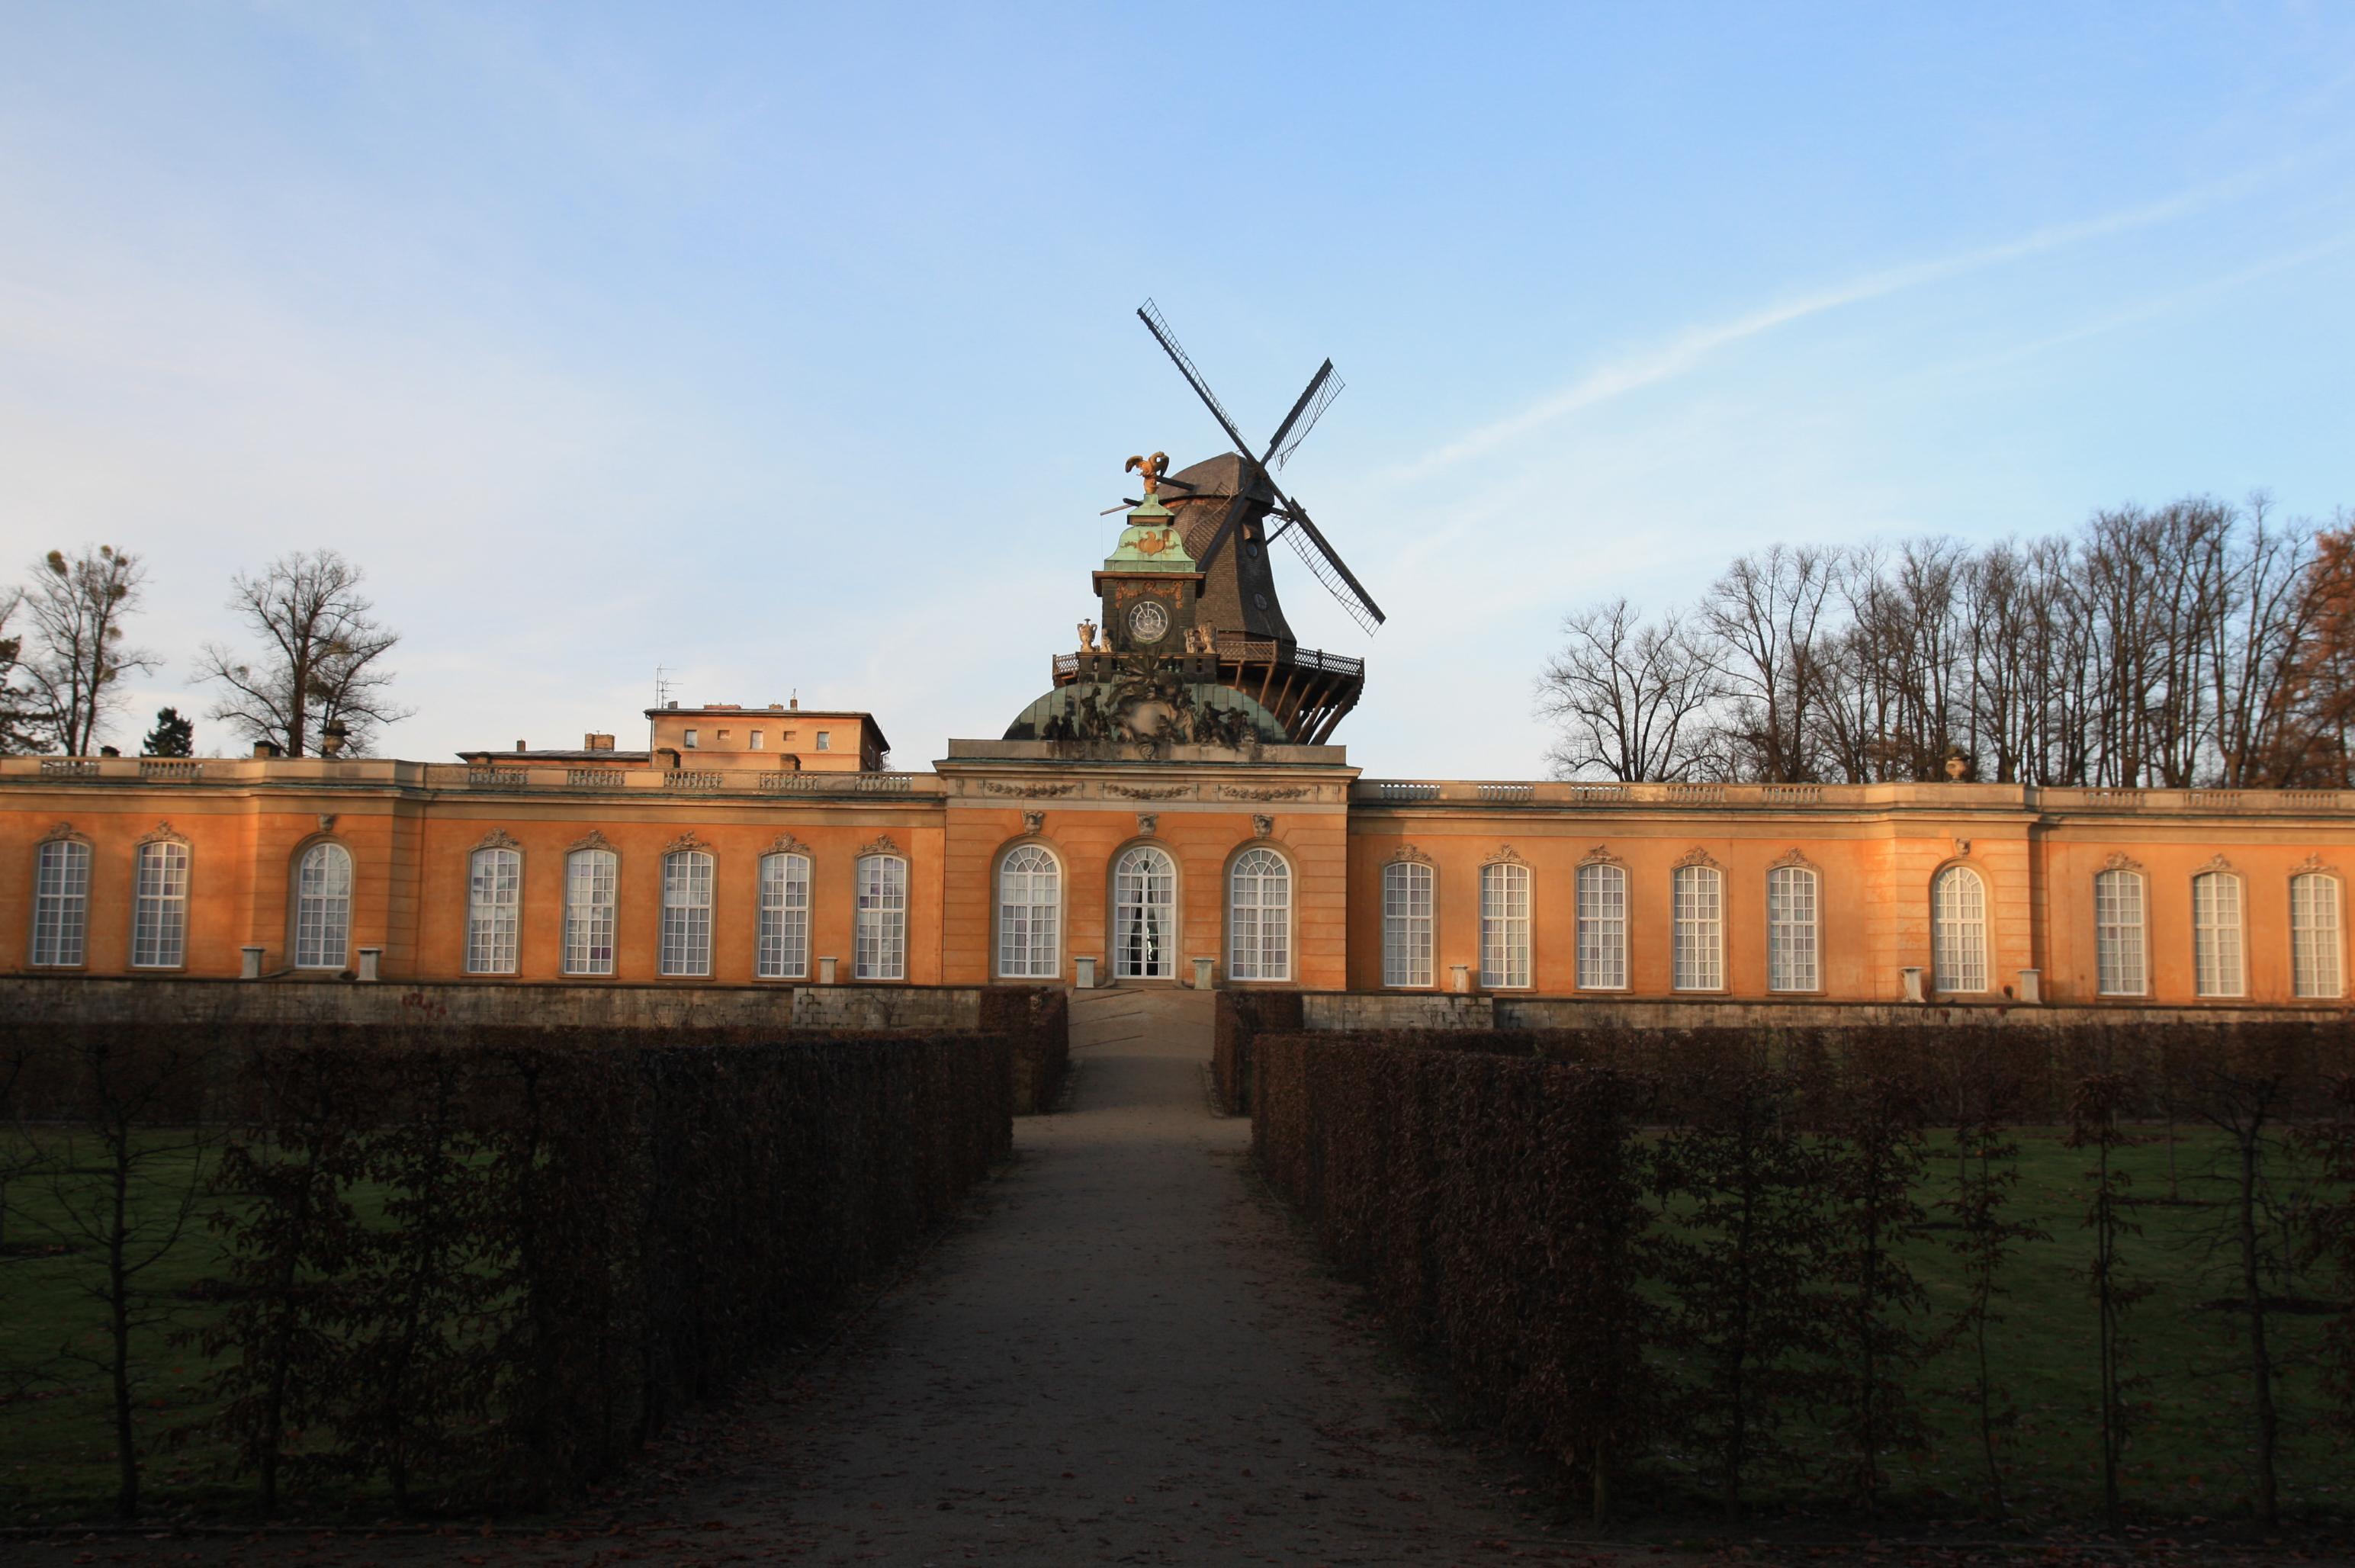 The Historic Windmill